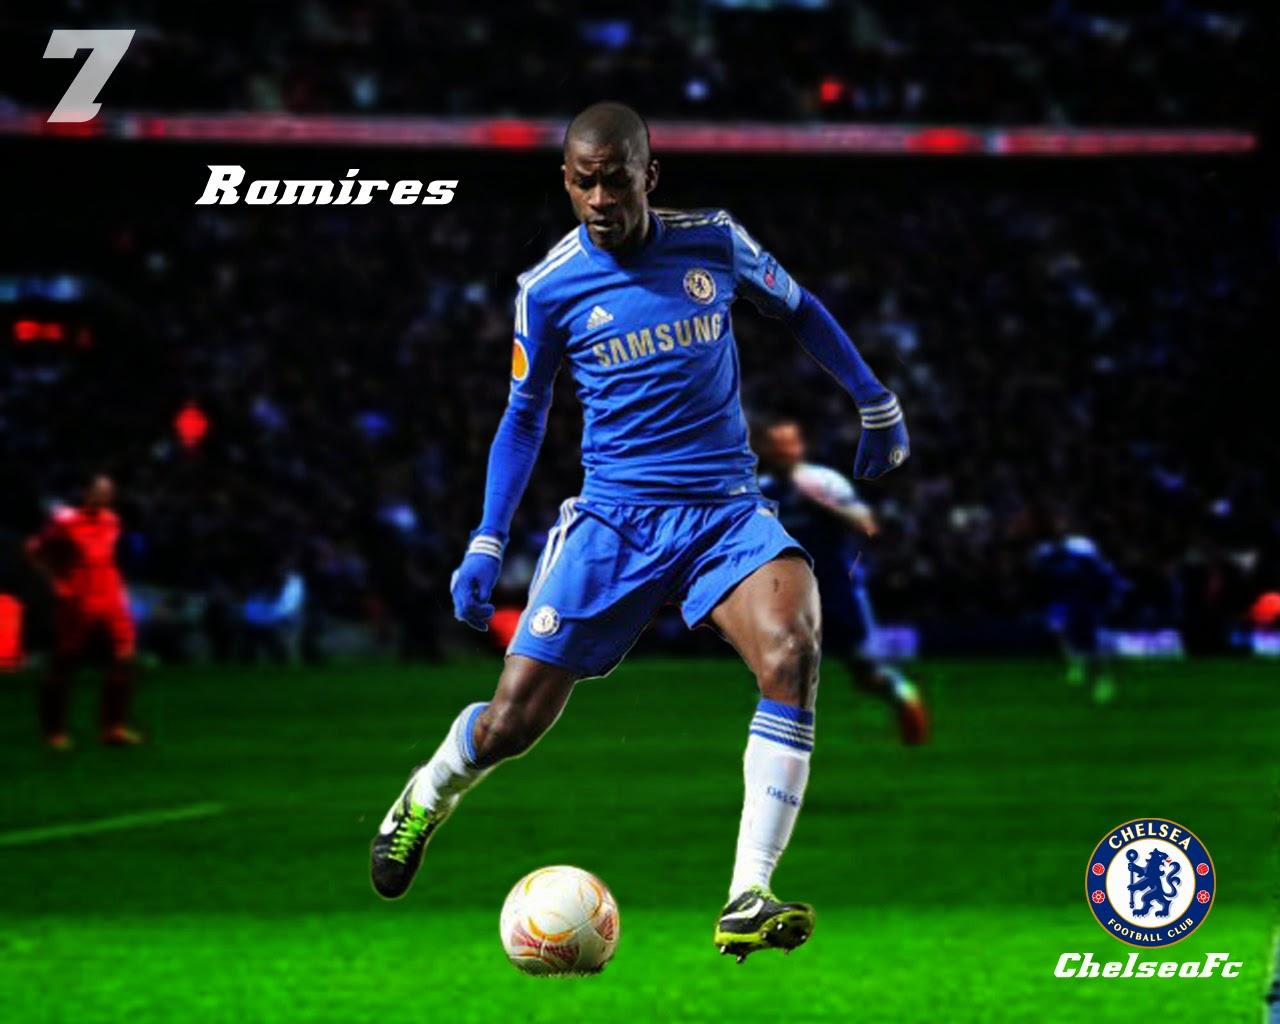 Ramires Wallpaper Chelsea Player Football Wallpaper